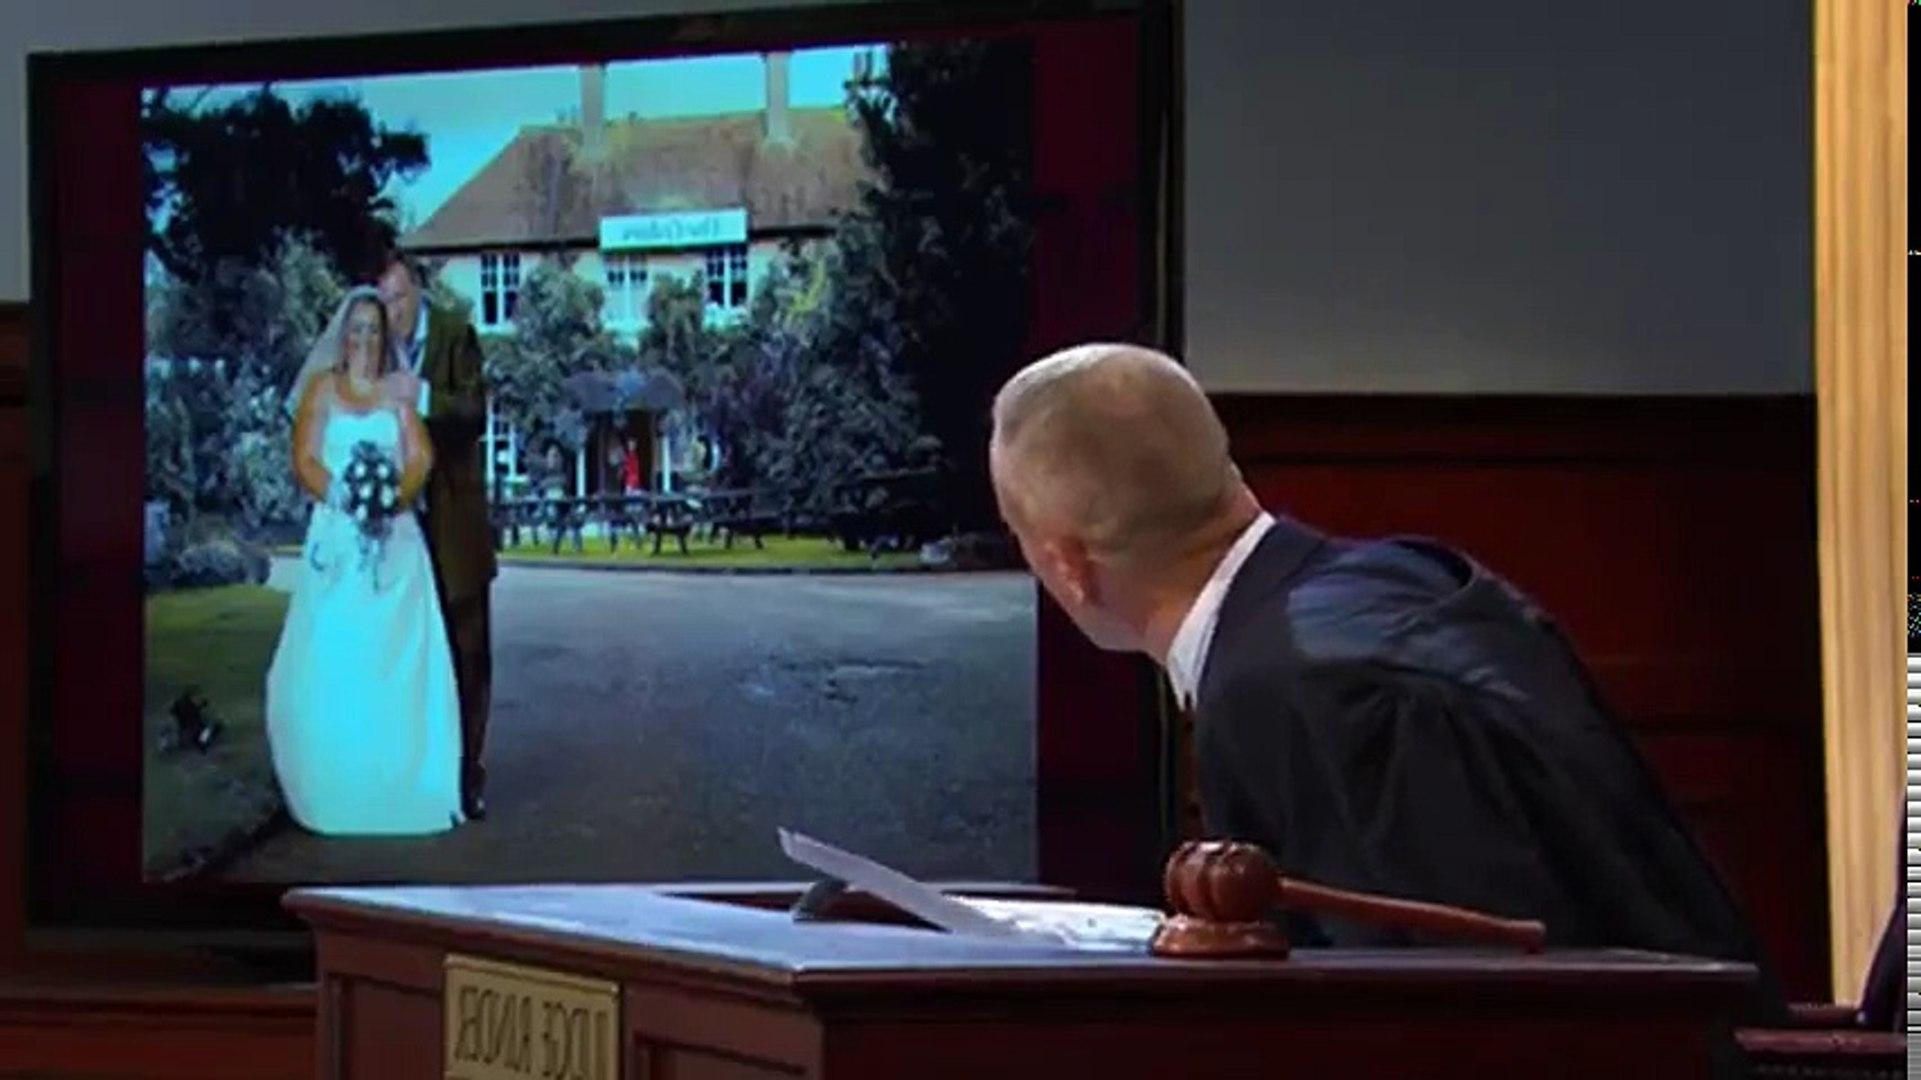 Judge Rinder S01 - Ep01 John V Cuan, Nocawe V James, Shauna V Naomi HD Watch